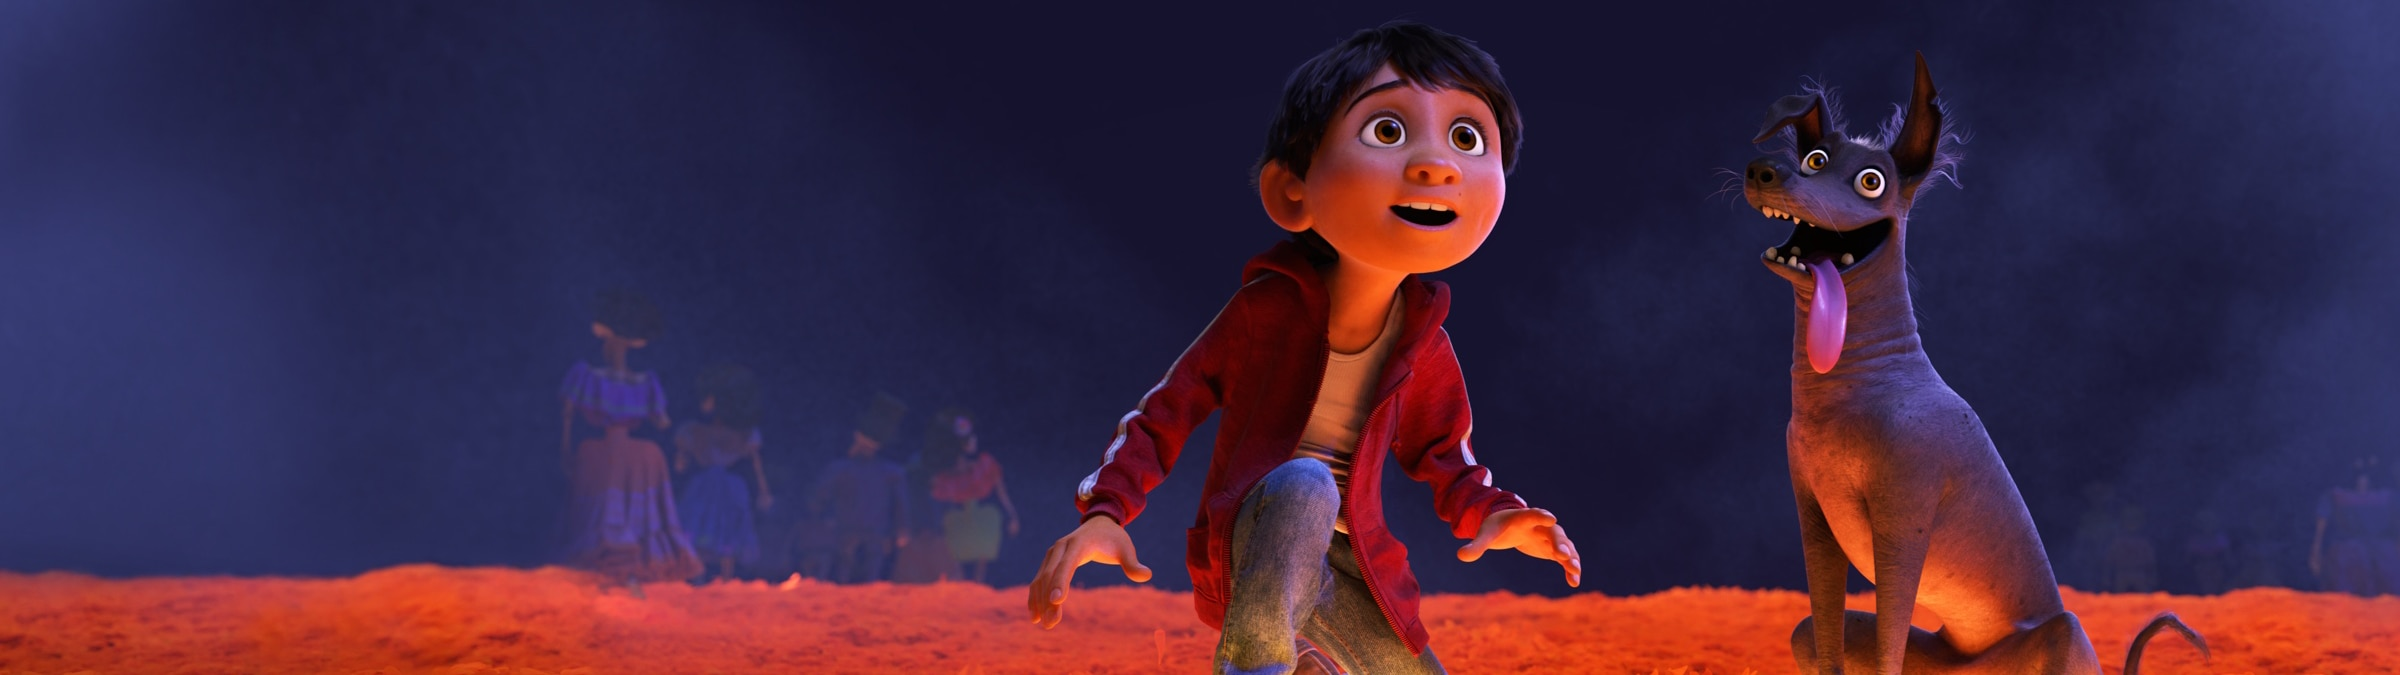 Coco 2018 Film Official Disney Uk Site